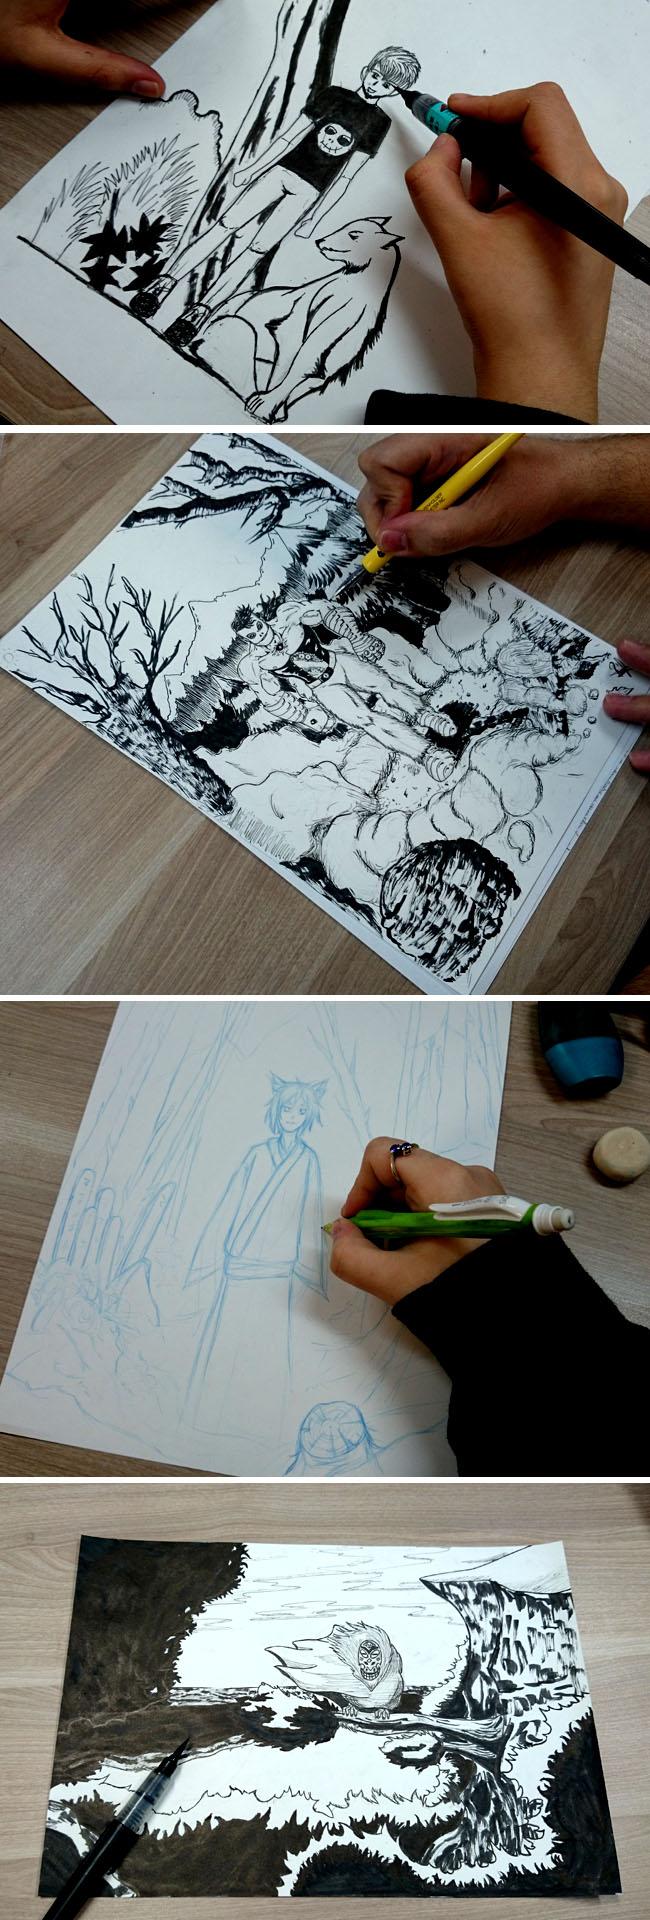 Banner_entintando_pincel_cursos_comic_manga_academiac10_madrid